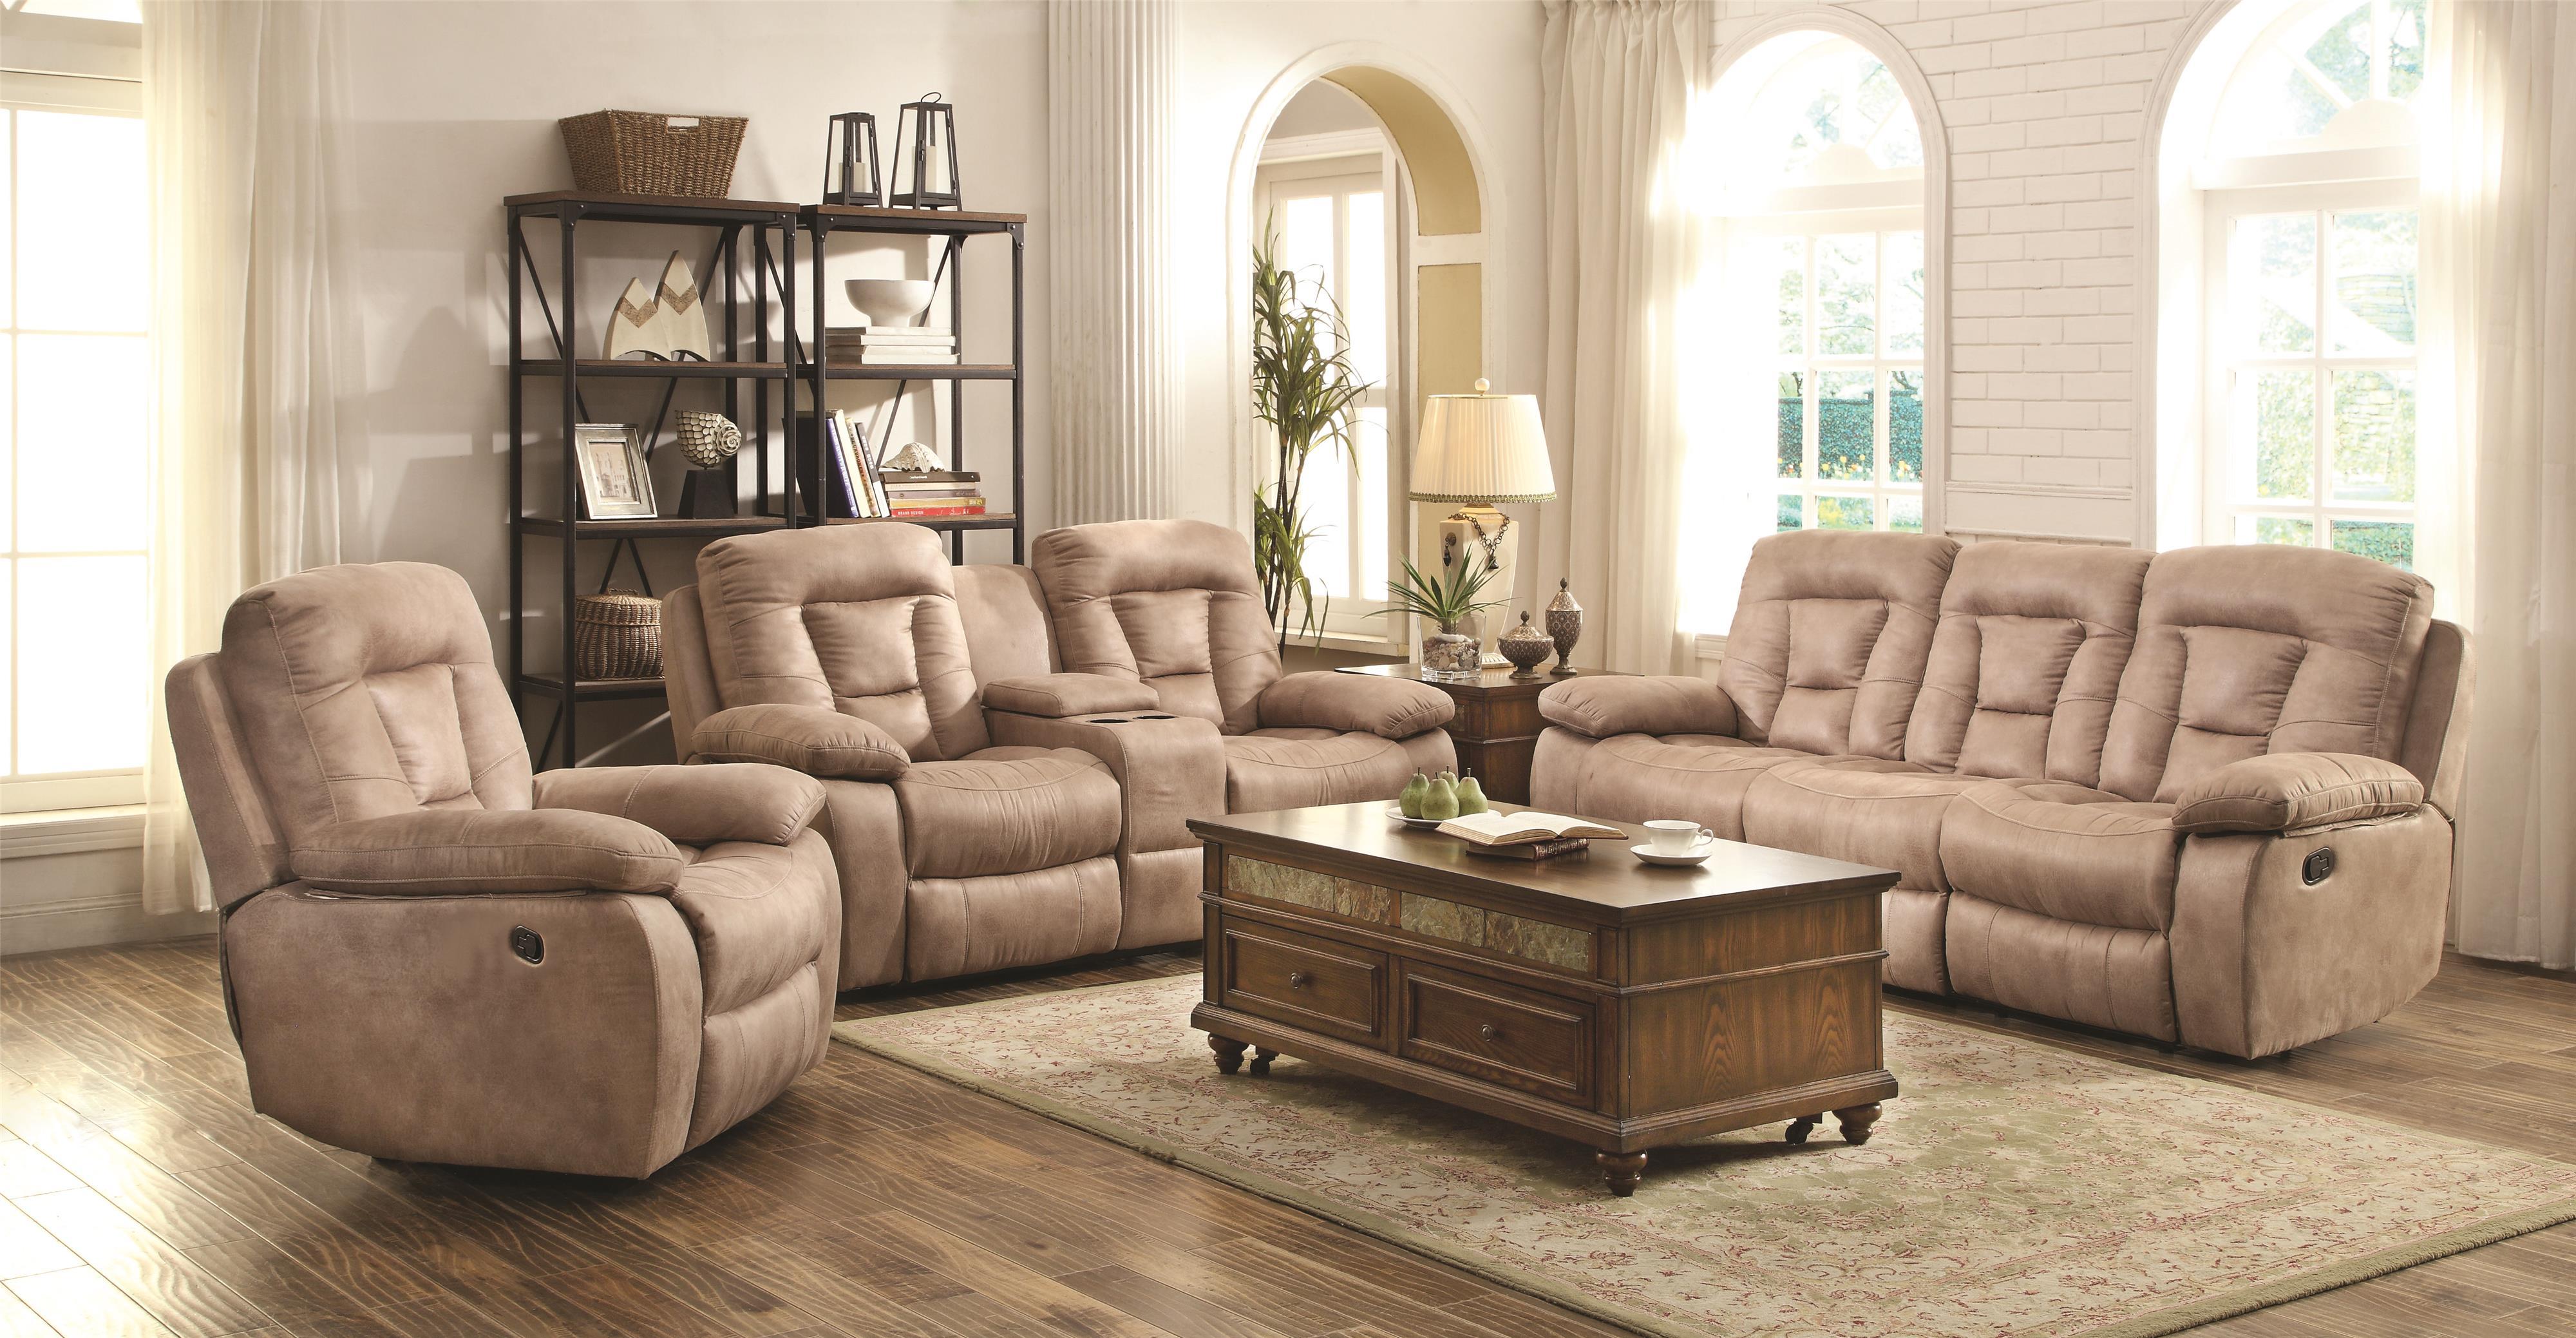 Coaster Evensky Reclining Living Room Group - Item Number: 60186-Bone Living Room Group 1